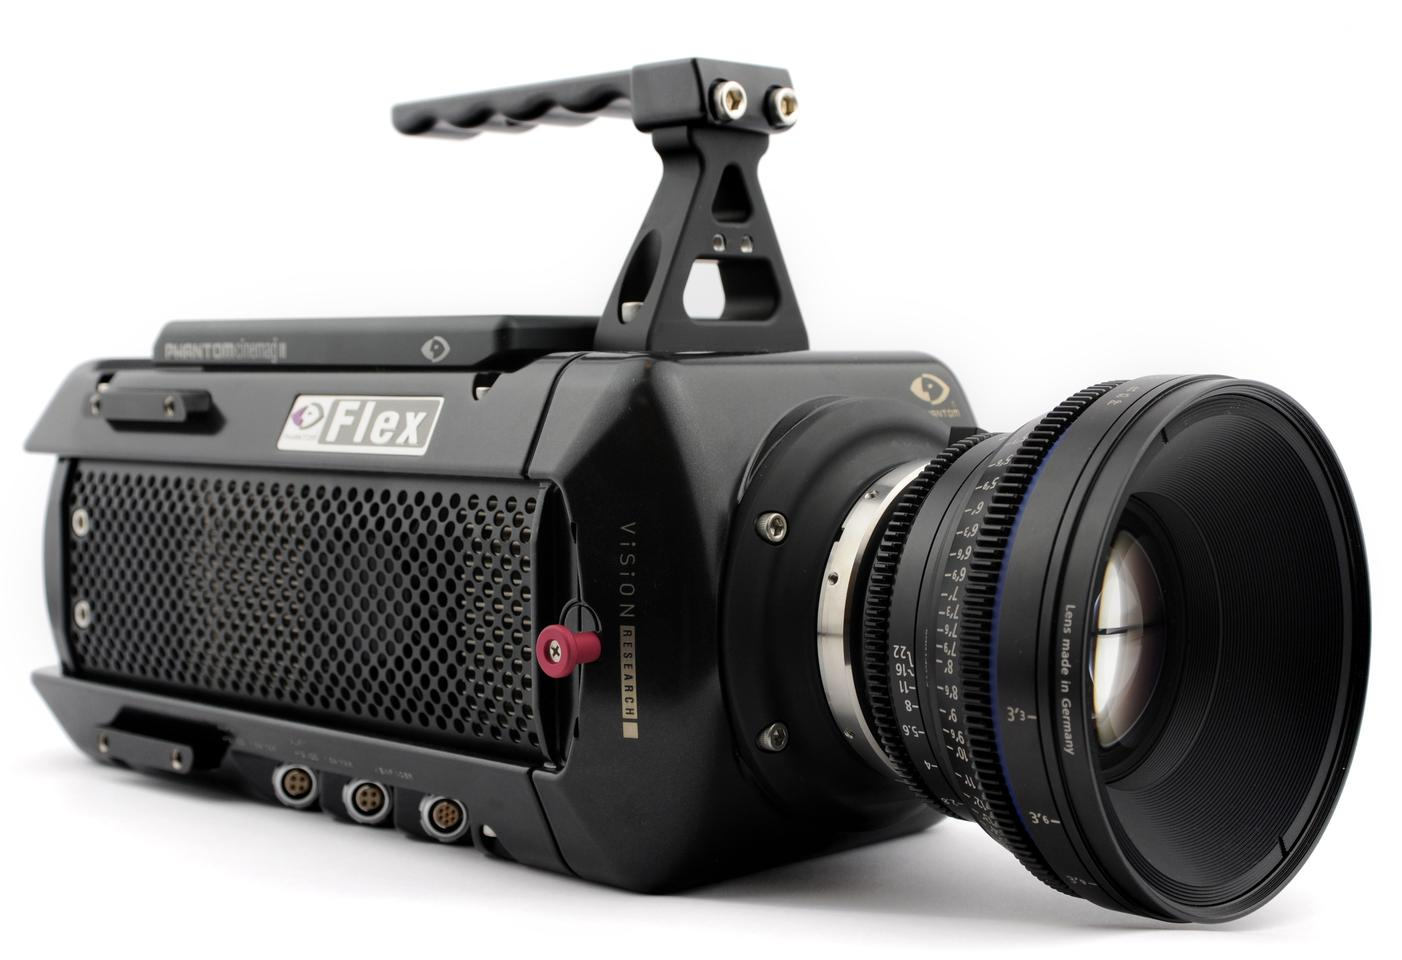 Vision Research's new Phantom Flex digital high-speed video camera